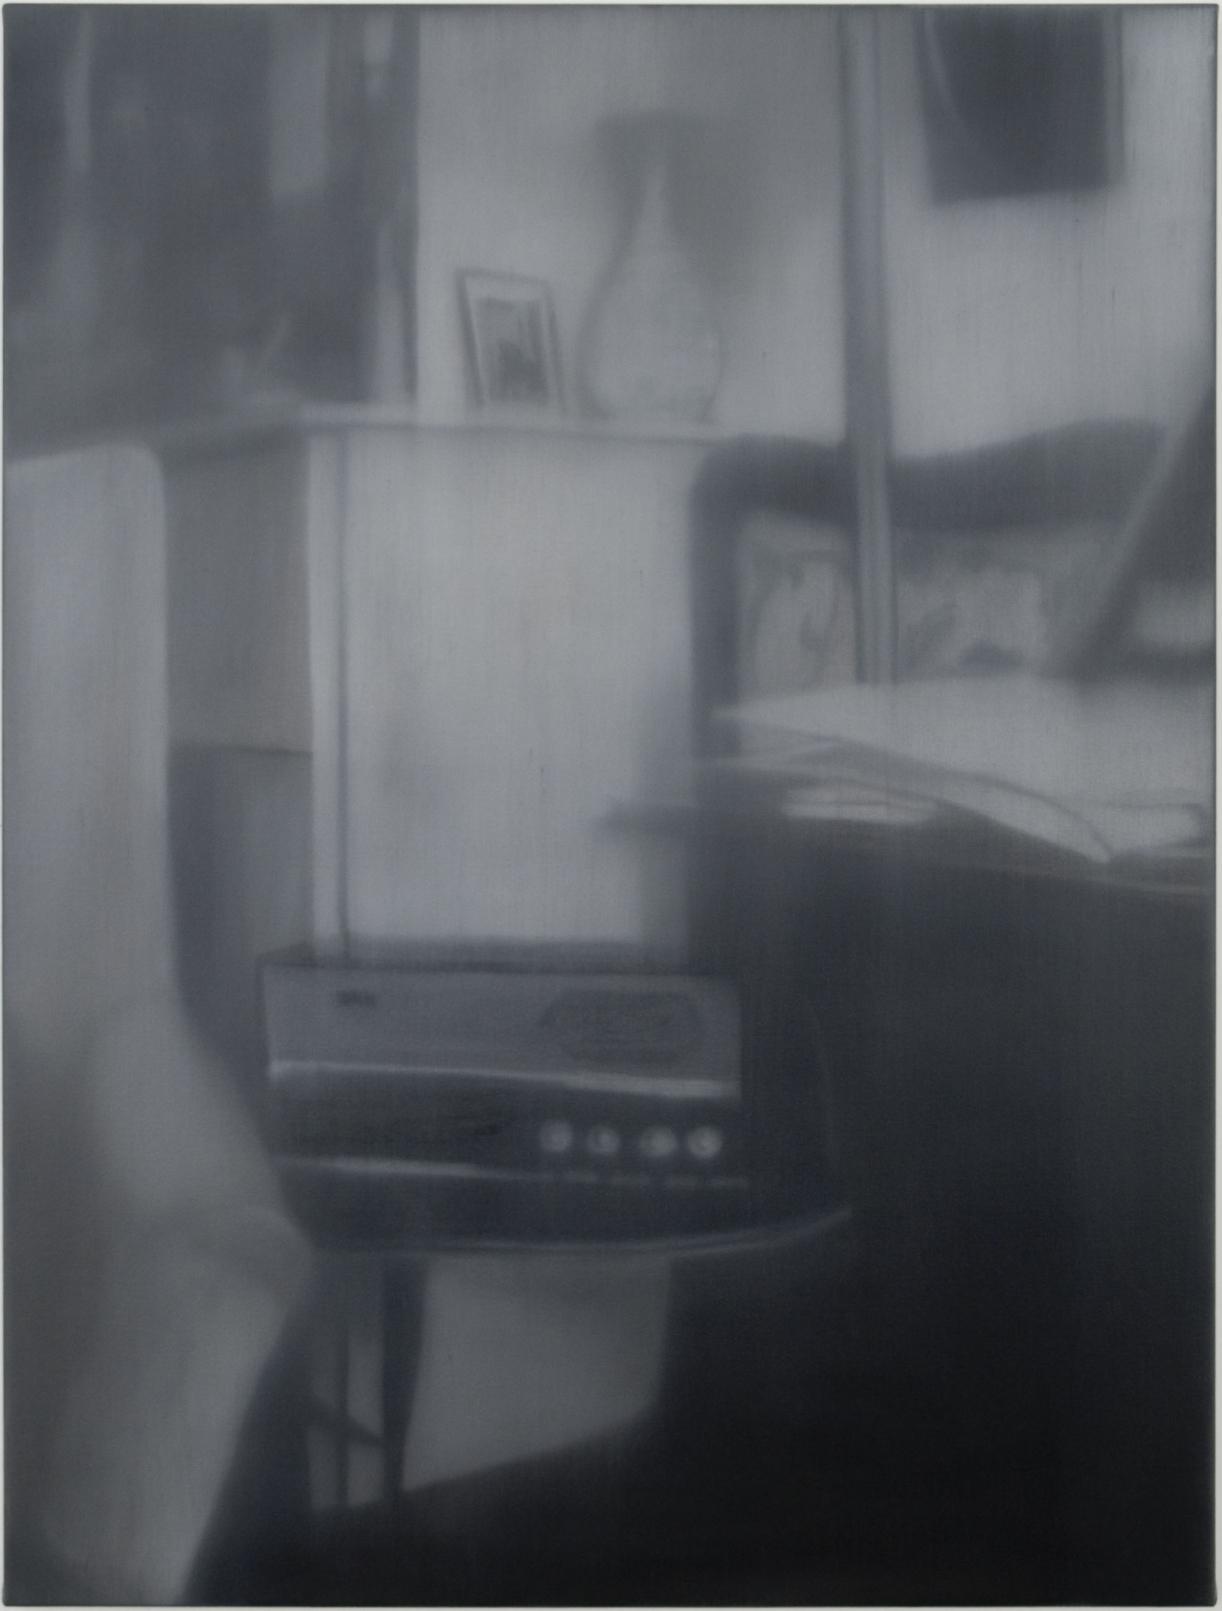 Bert de Beul, Untitled, 2009, Oil on canvas